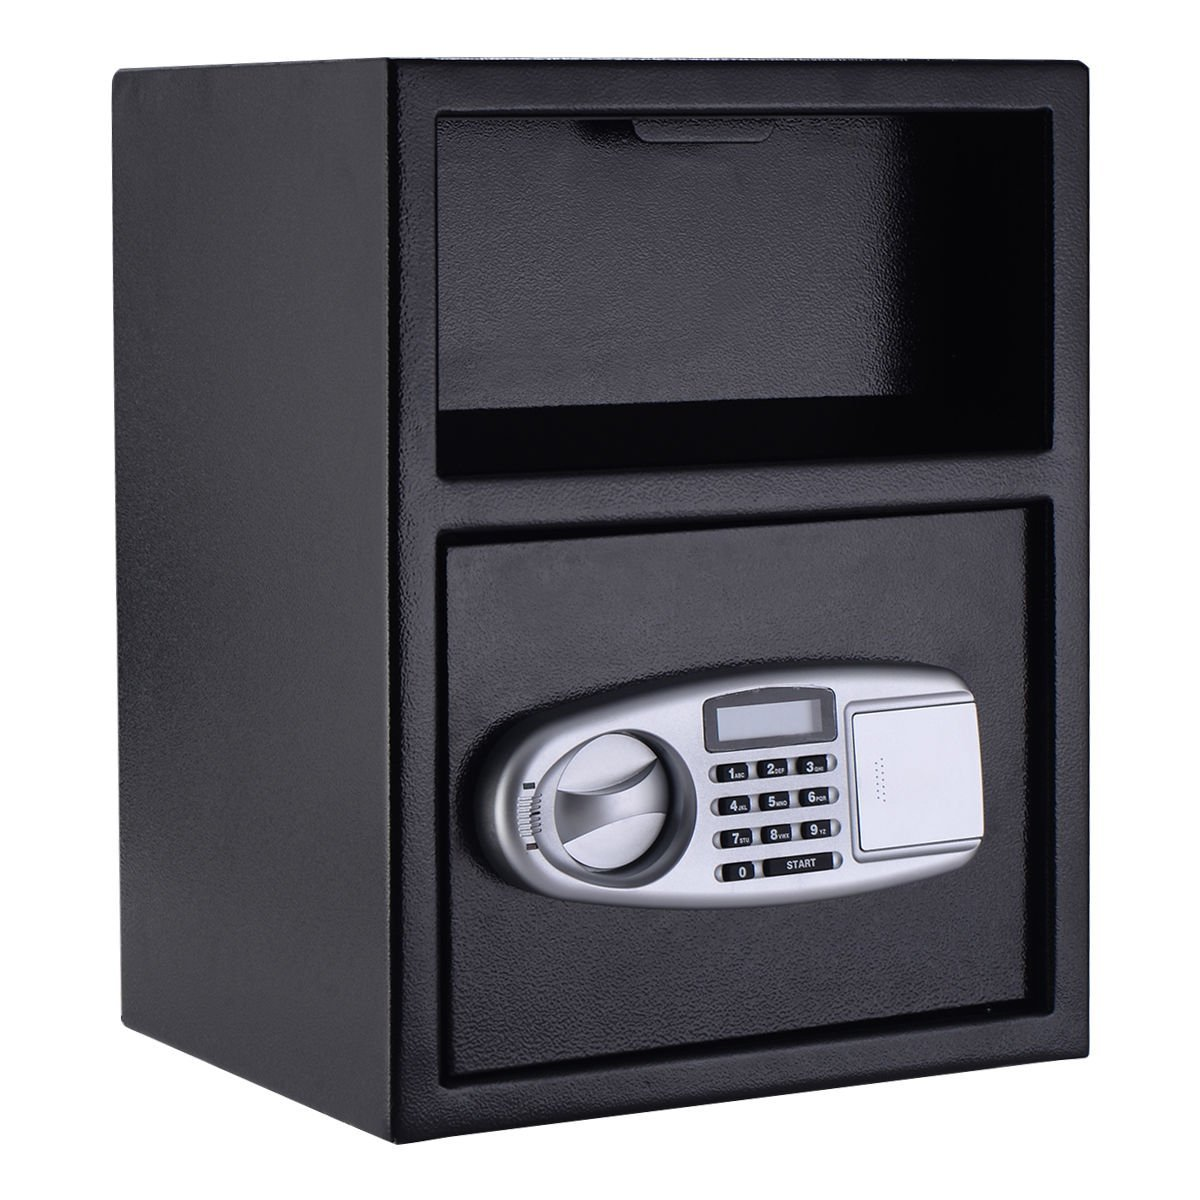 Moon Daughter Digital Safe Box Depository Drop Deposit Front Load Cash Vault Lock Home Jewelry 6mm Door Thickness